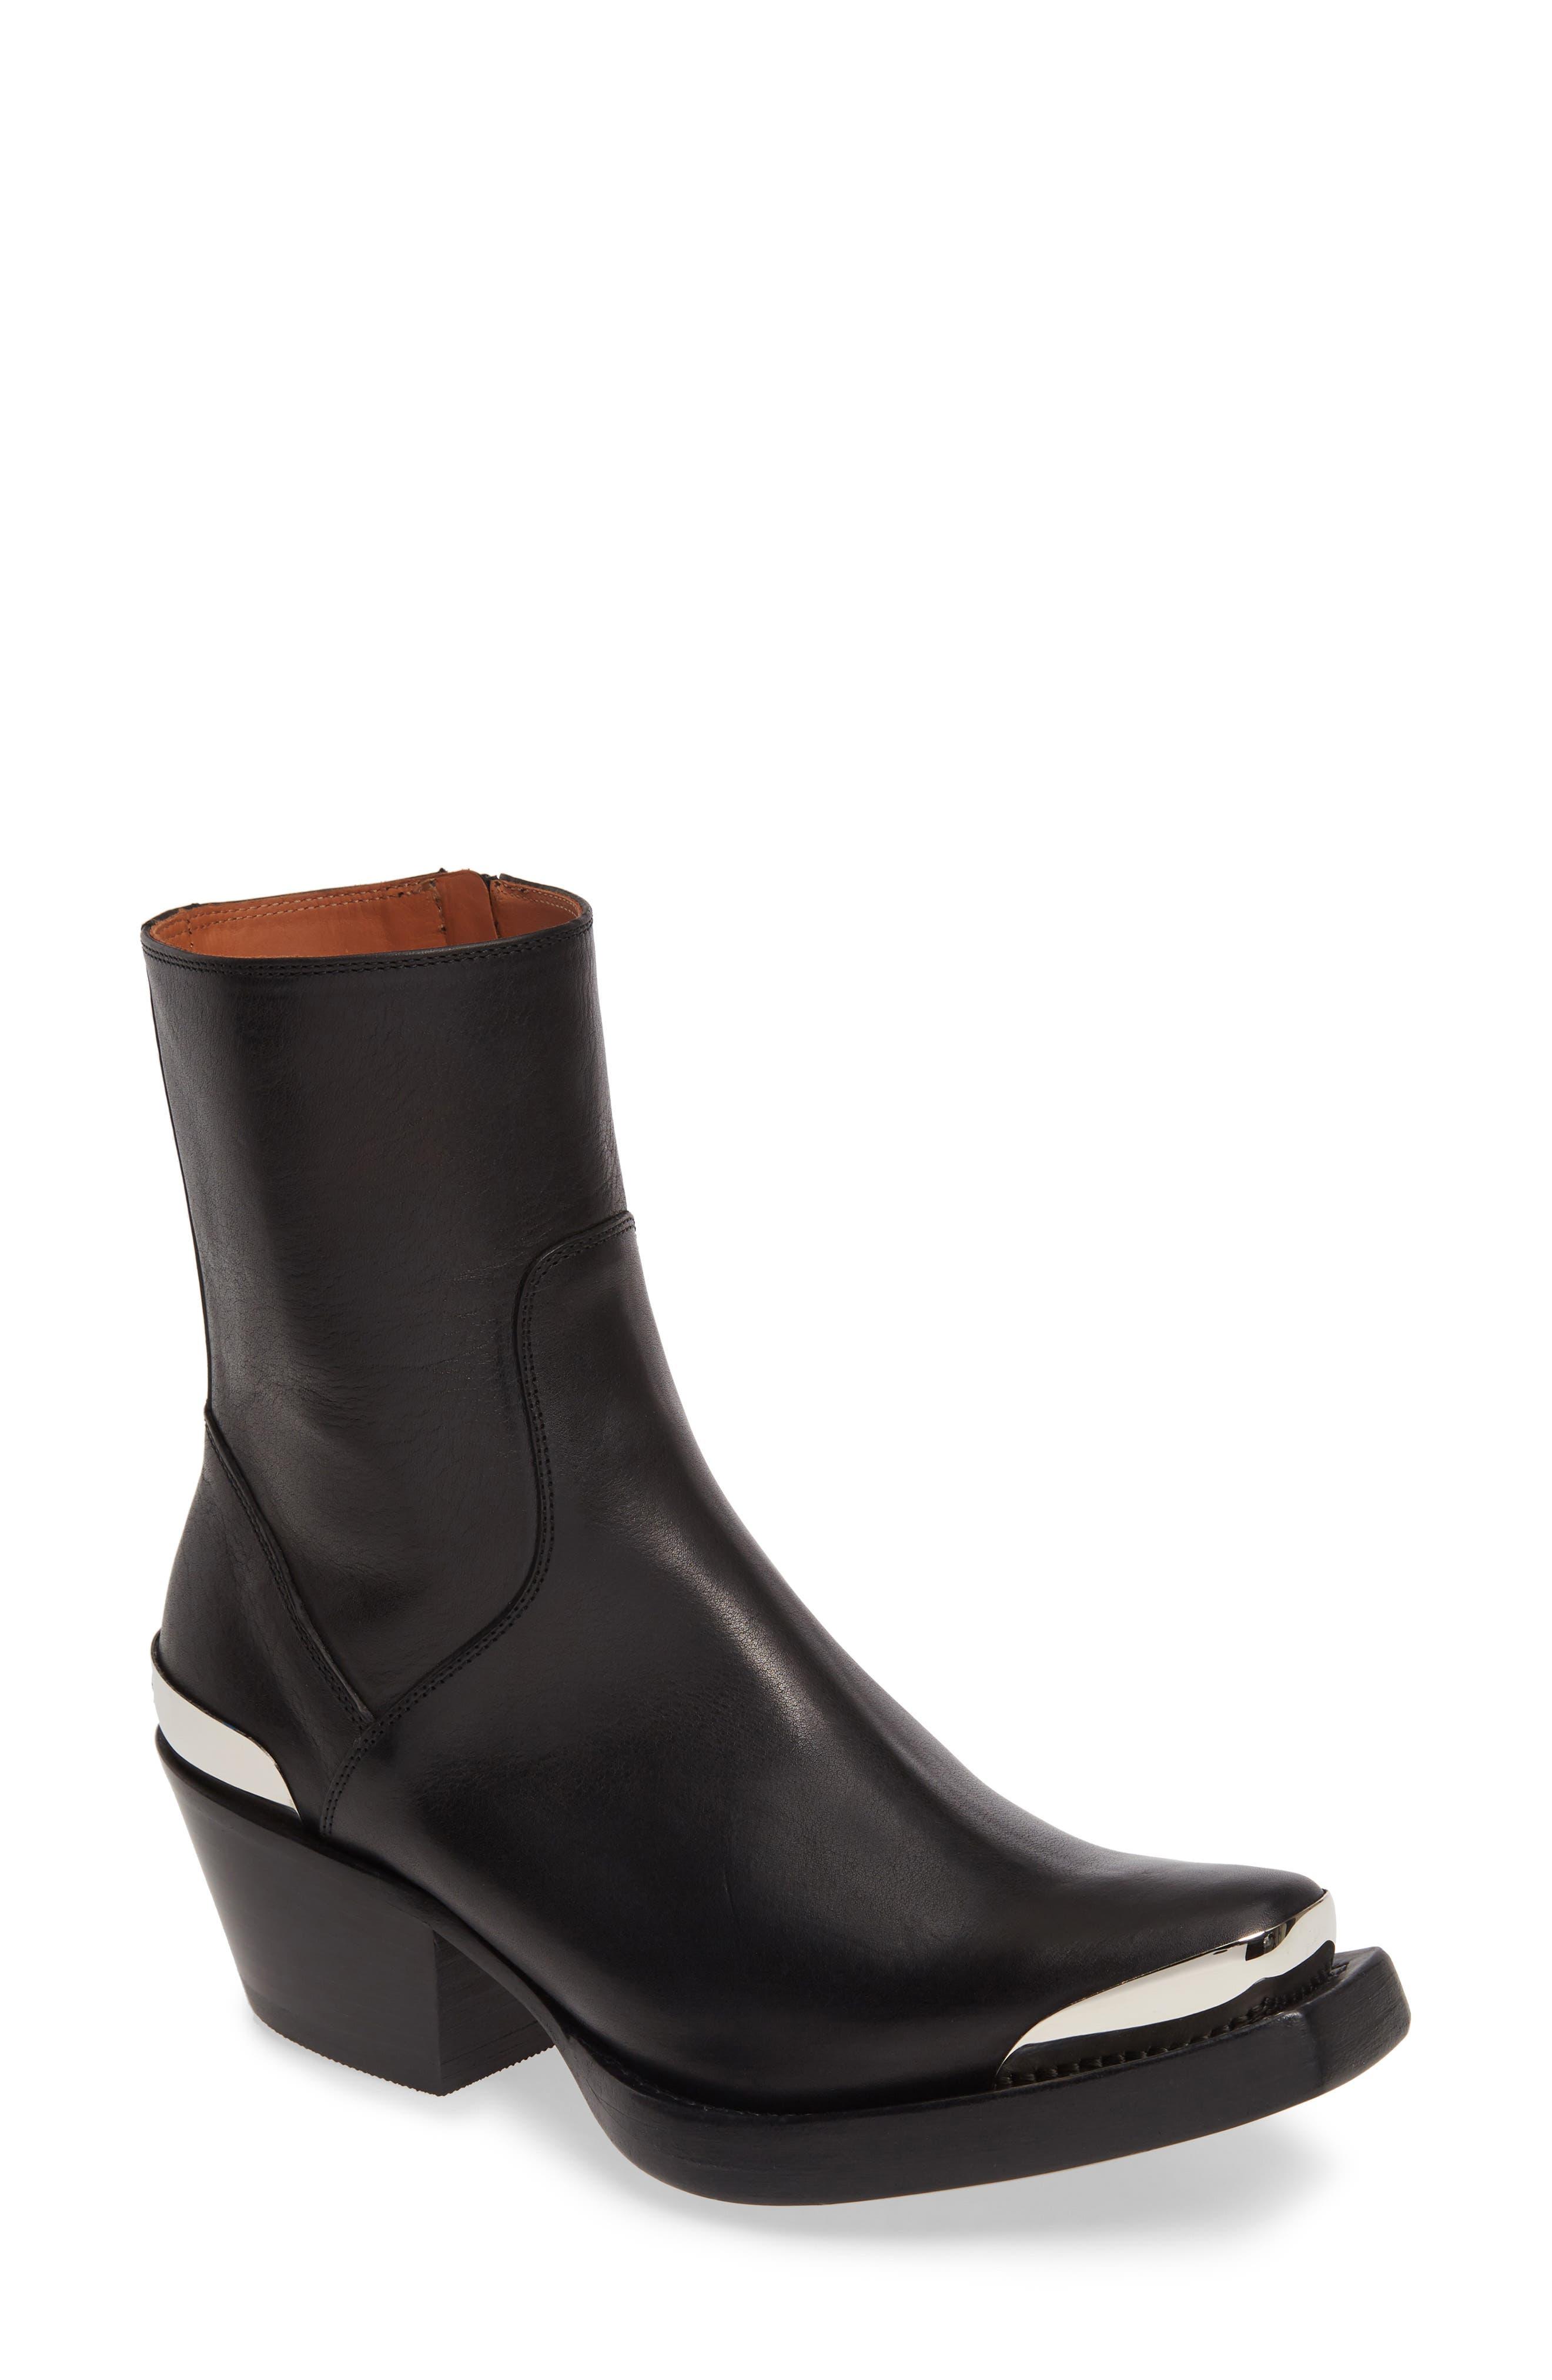 35679bde5f0f Women s Designer Shoes